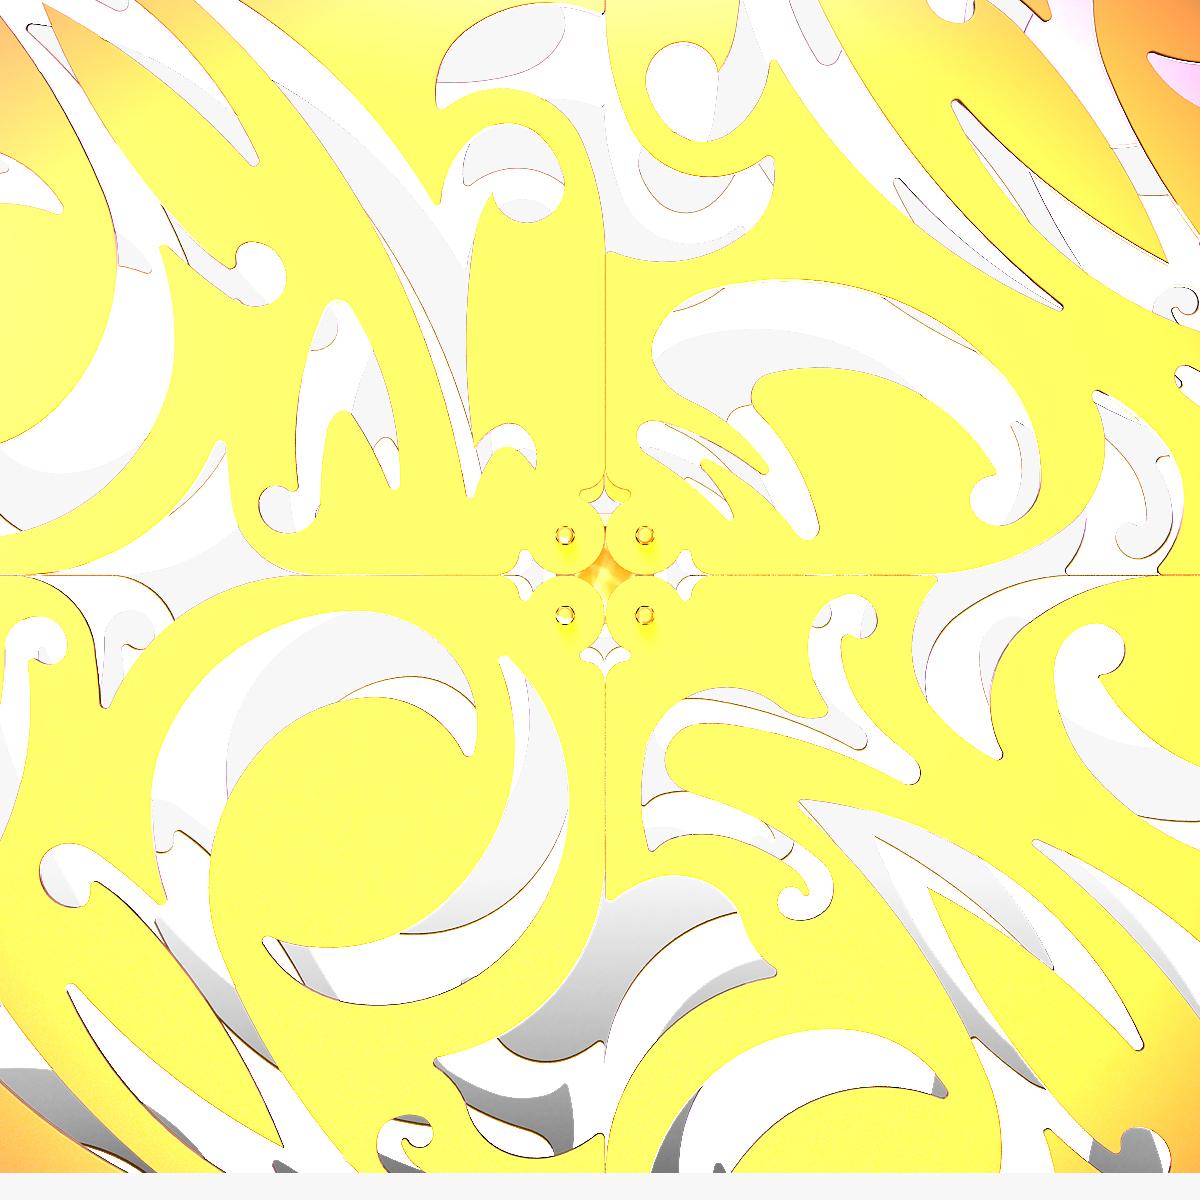 70-07-09-1200x1200.jpg Download STL file Stage Decor Collection 01 (Modular 9 Pieces) • 3D printer model, akerStudio